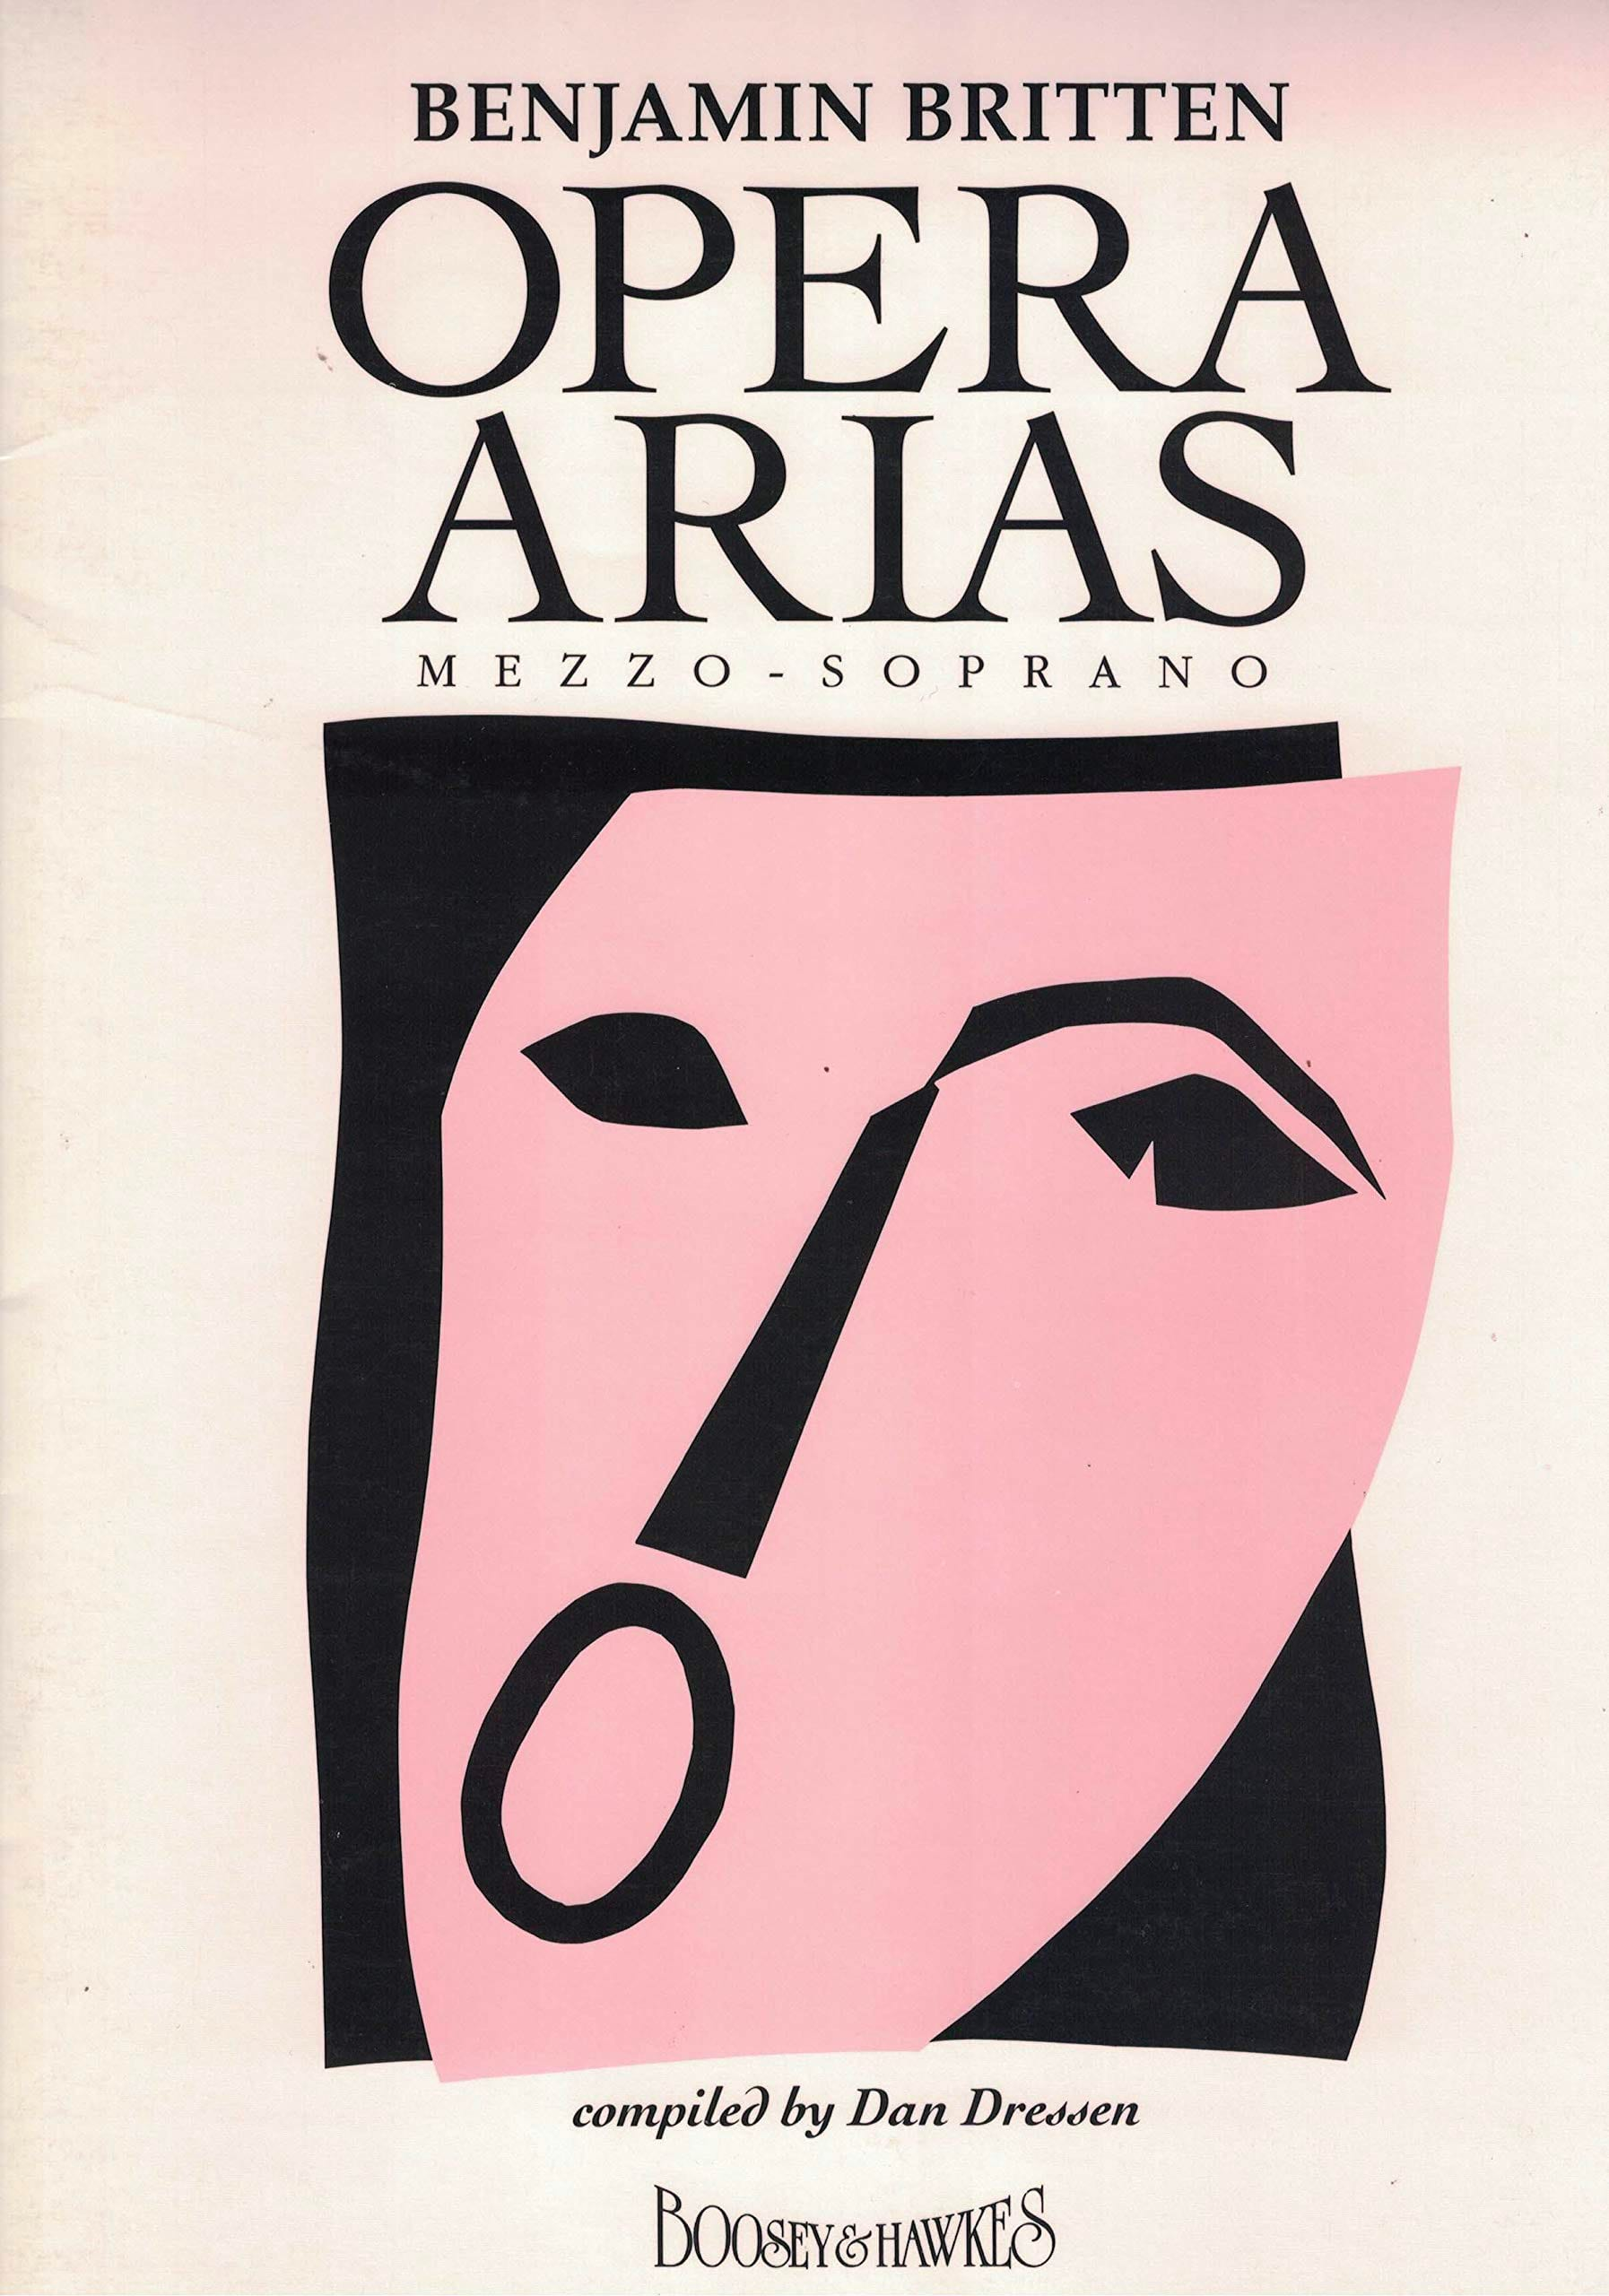 Opera Arias Mezzo Soprano - BRITTEN - Partition - laflutedepan.com